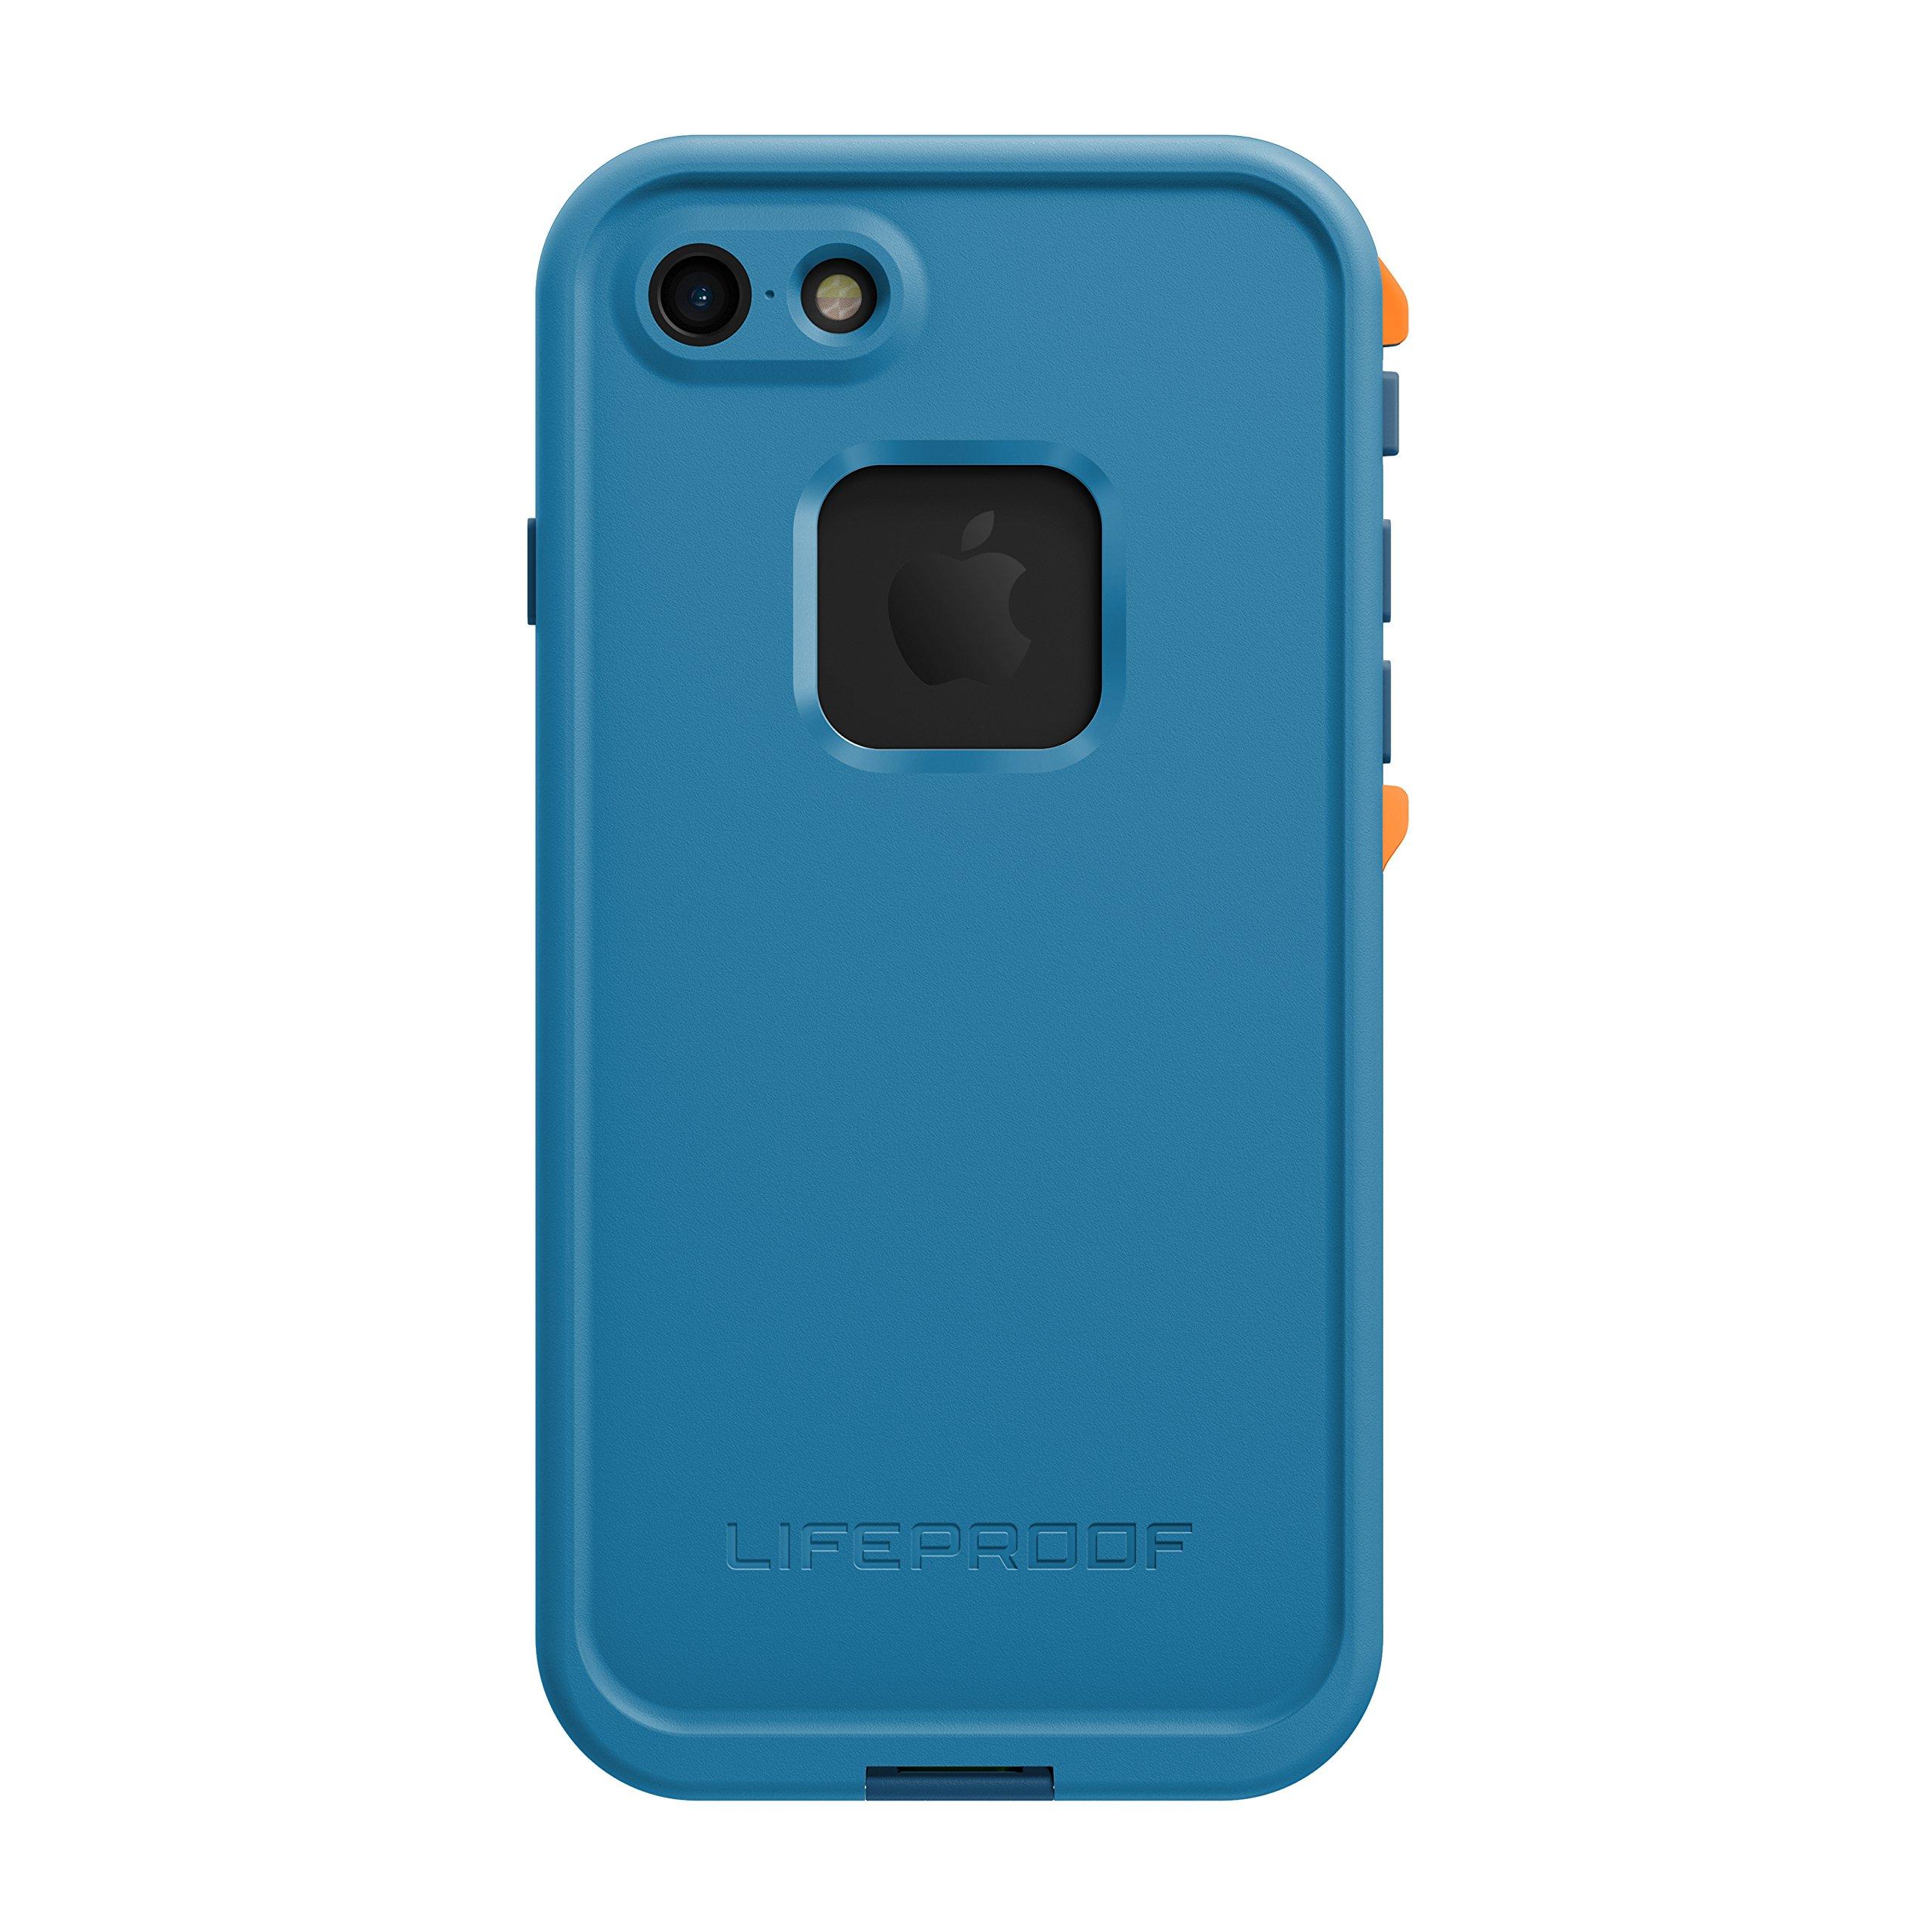 Lifeproof FRĒ SERIES Waterproof Case for iPhone 7 (ONLY) - Retail Packaging - BASE CAMP BLUE (COWABUNGA BLUE/WAVE CRASH/MANGO TANGO)